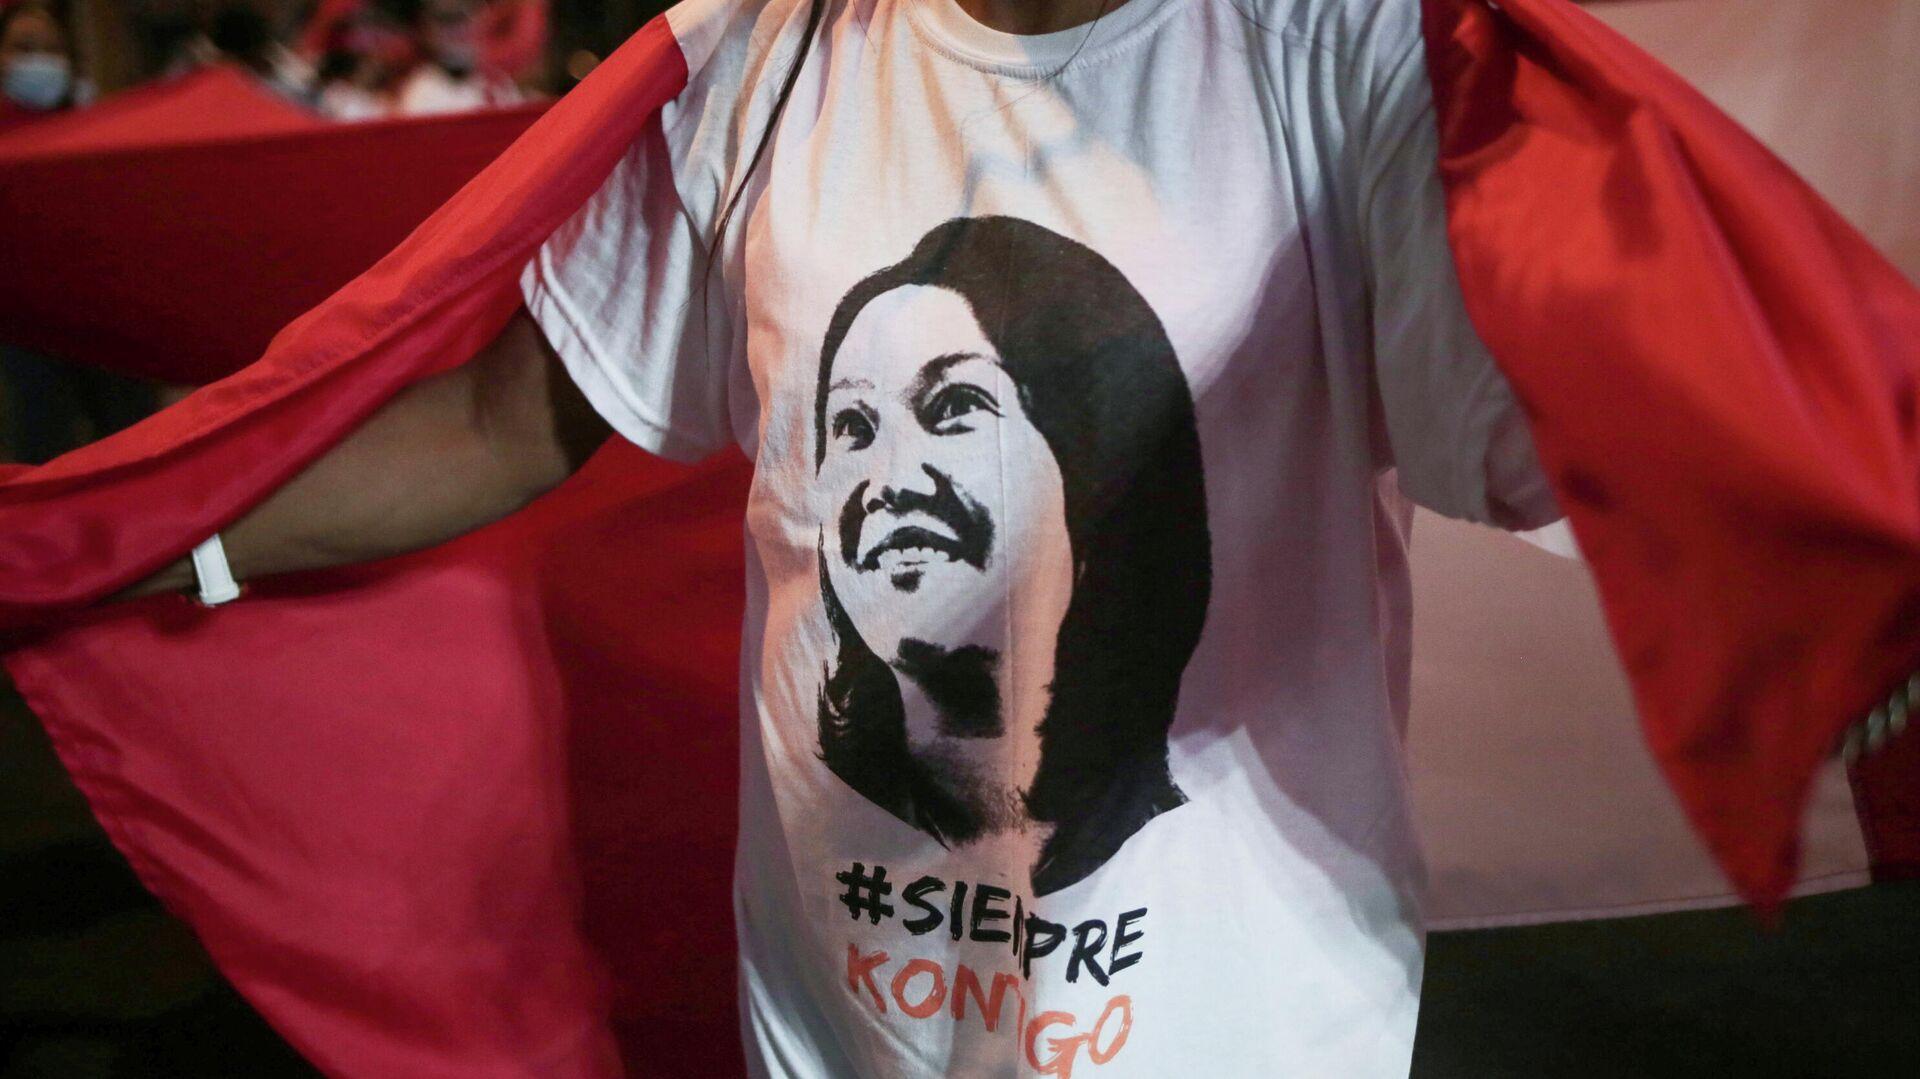 Partidaria de la candidata a la presidencia de Perú, Keiko Fujimori - Sputnik Mundo, 1920, 02.07.2021